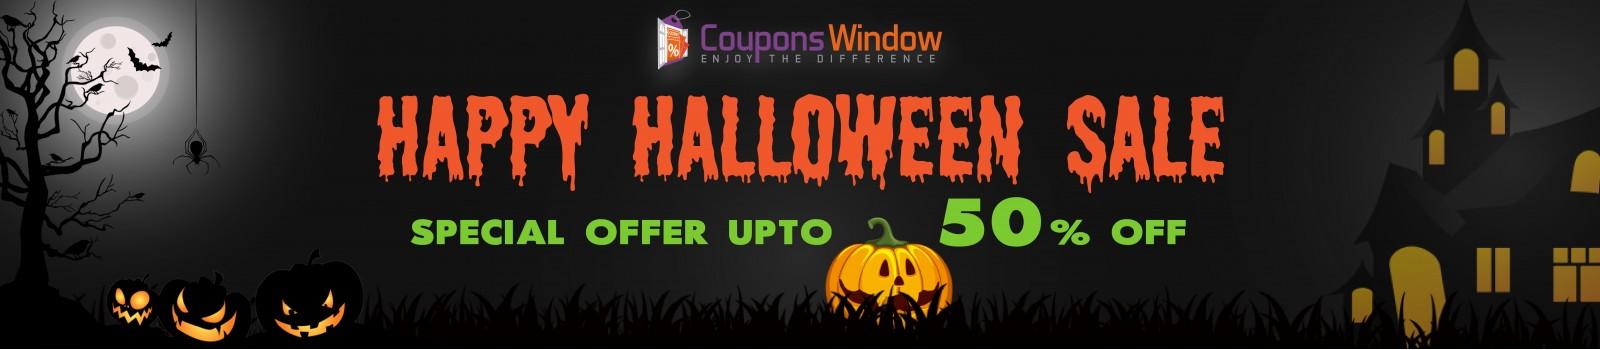 couponswindow-coupon-code